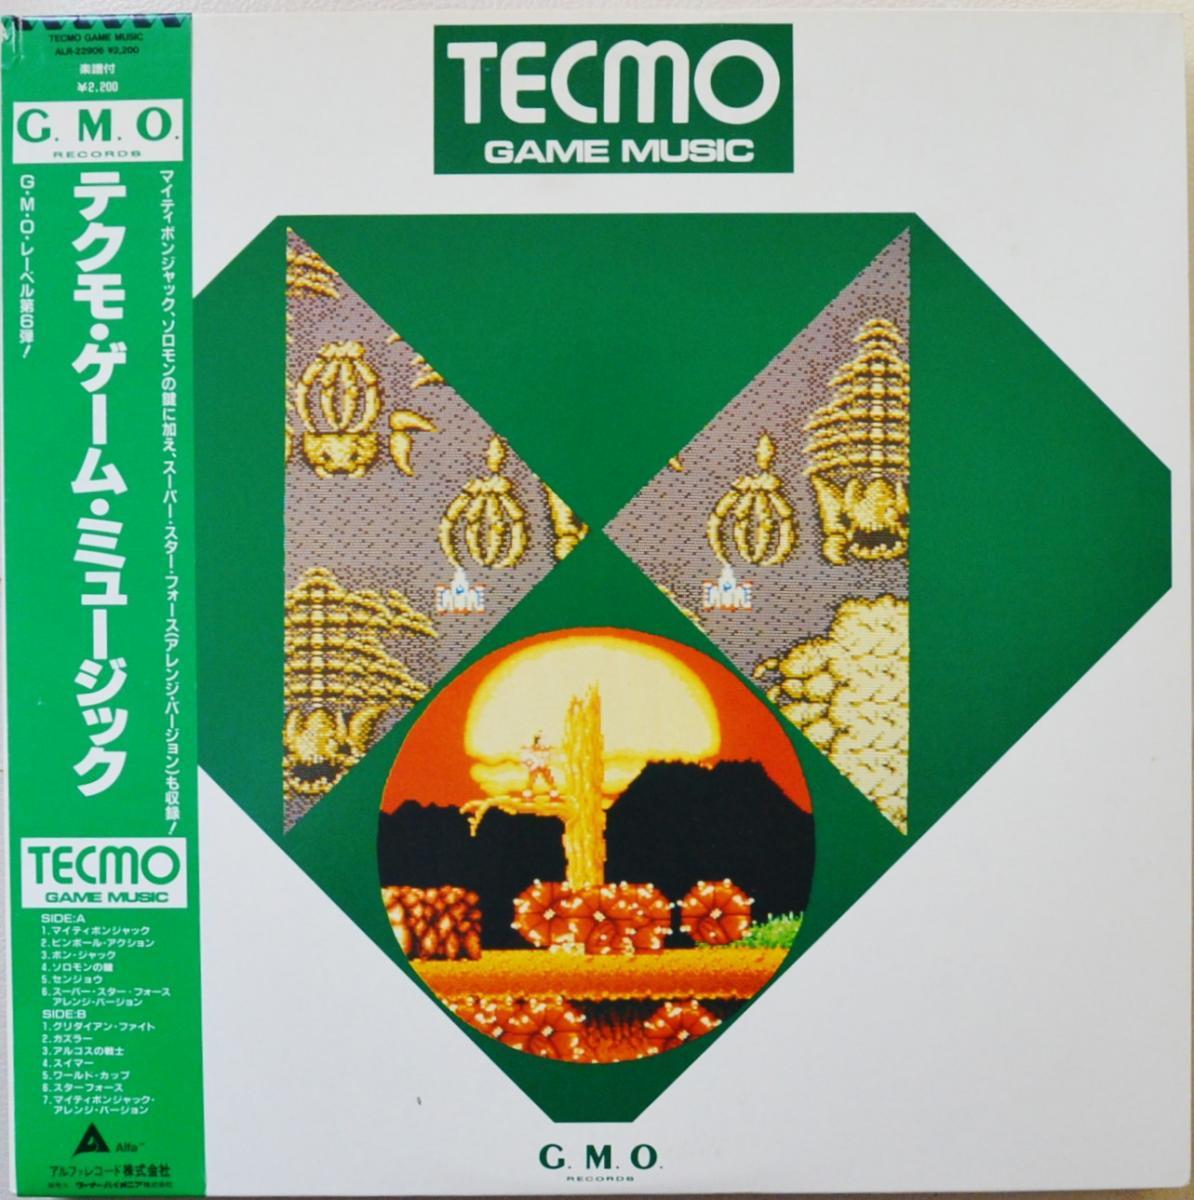 V.A. / テクモ・ゲーム・ミュージック / TECMO GAME MUSIC (LP)